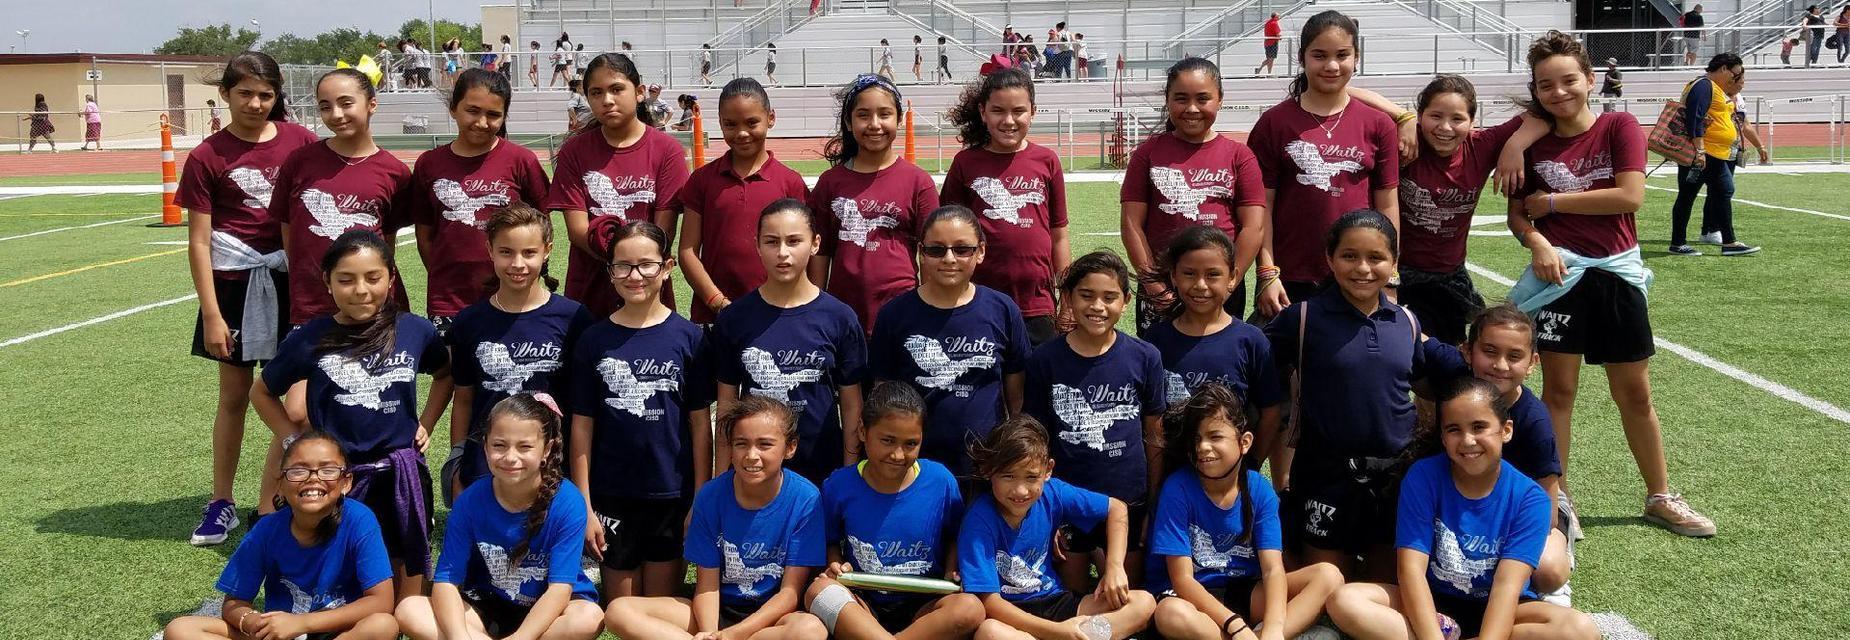 Girls Track team at meet